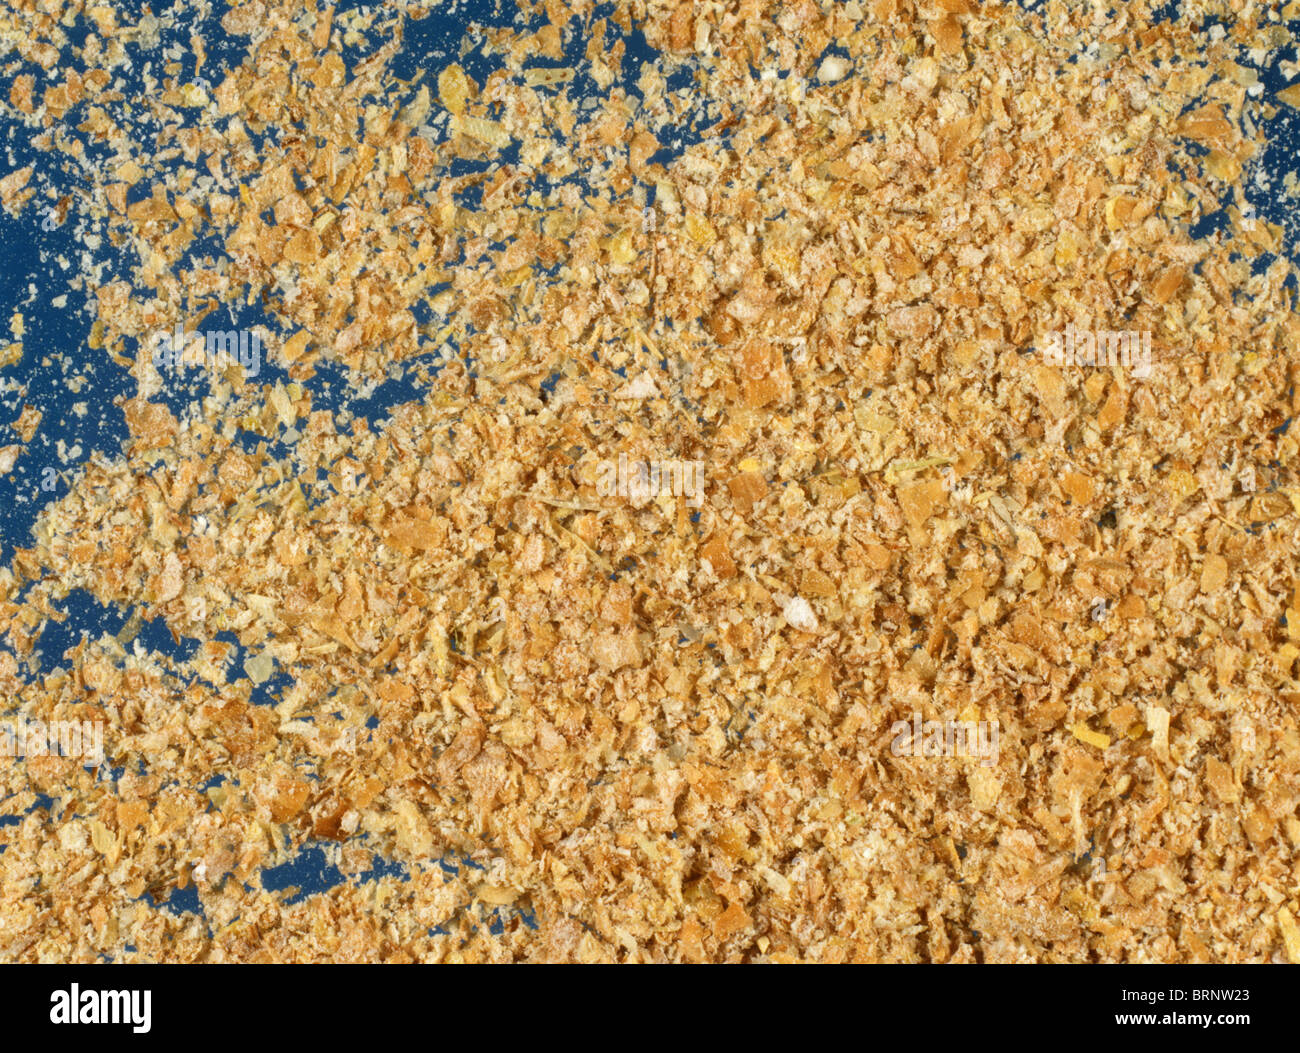 Wheat middlings Stock Photo: 31828107 - Alamy